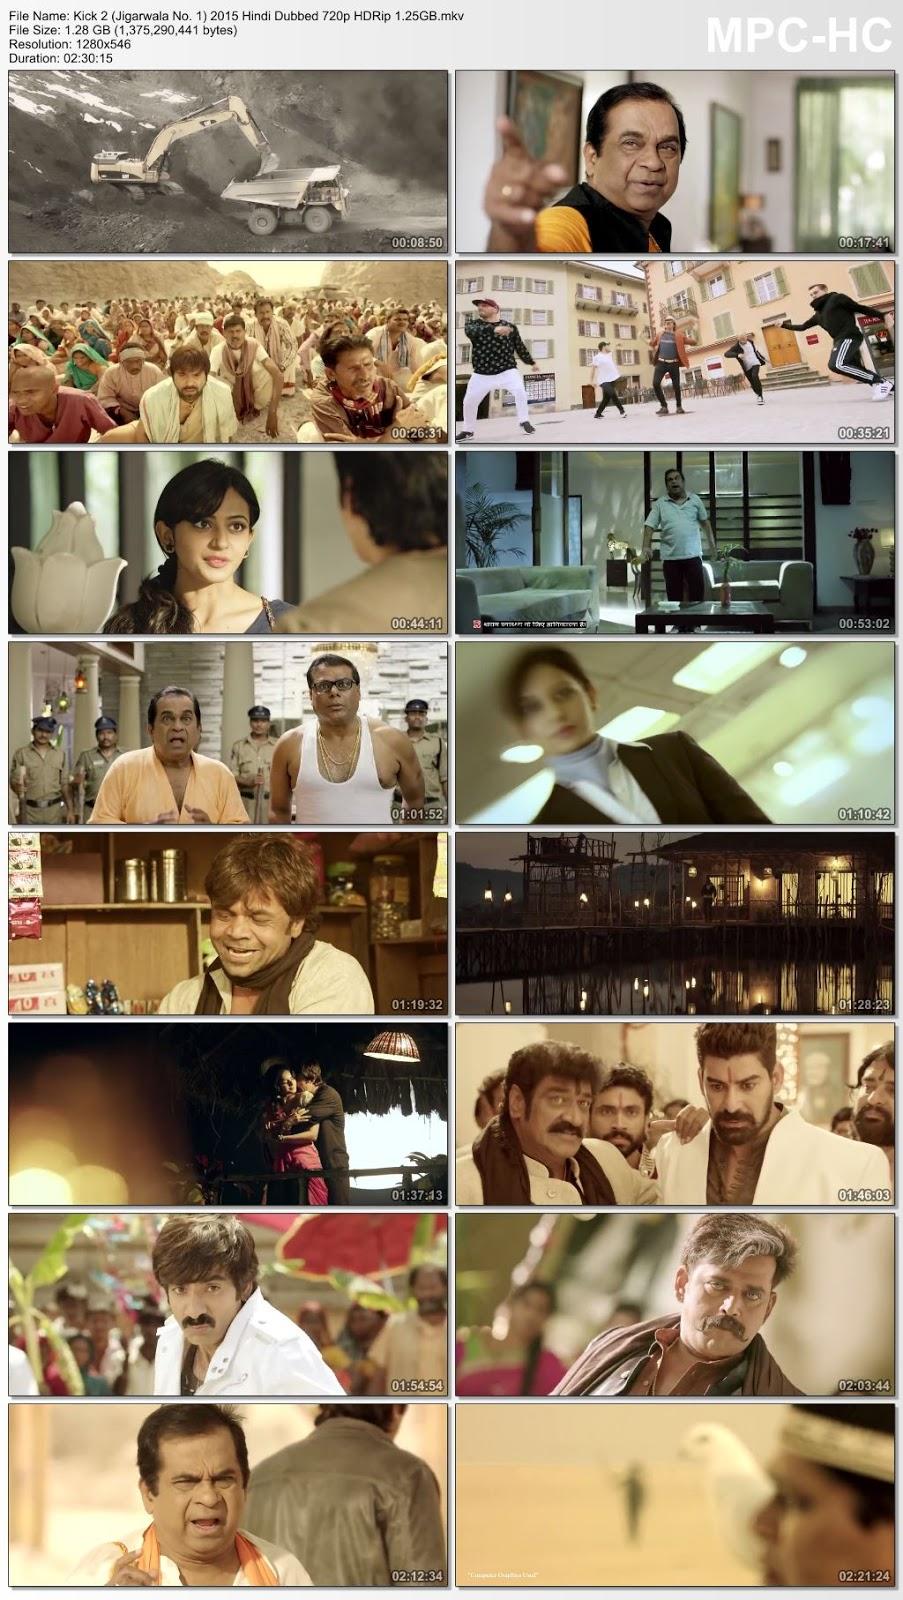 Kick 2 (2015) Hindi Dubbed 720p HDRip 1.25 GB Desirehub